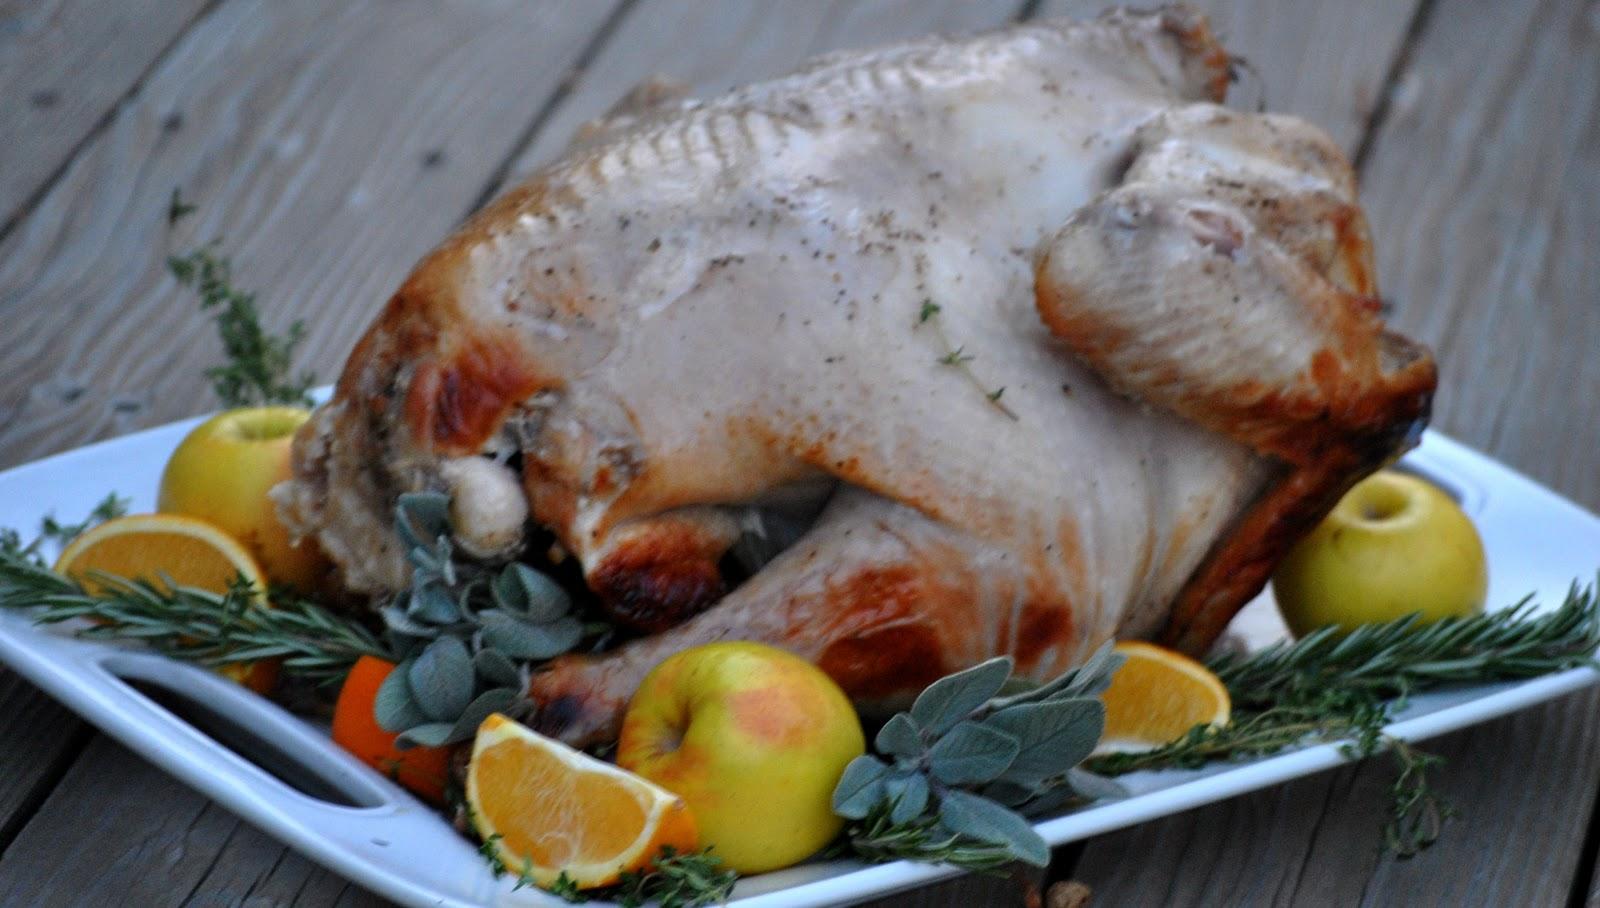 The Farm Girl Recipes: Cider Brined Turkey